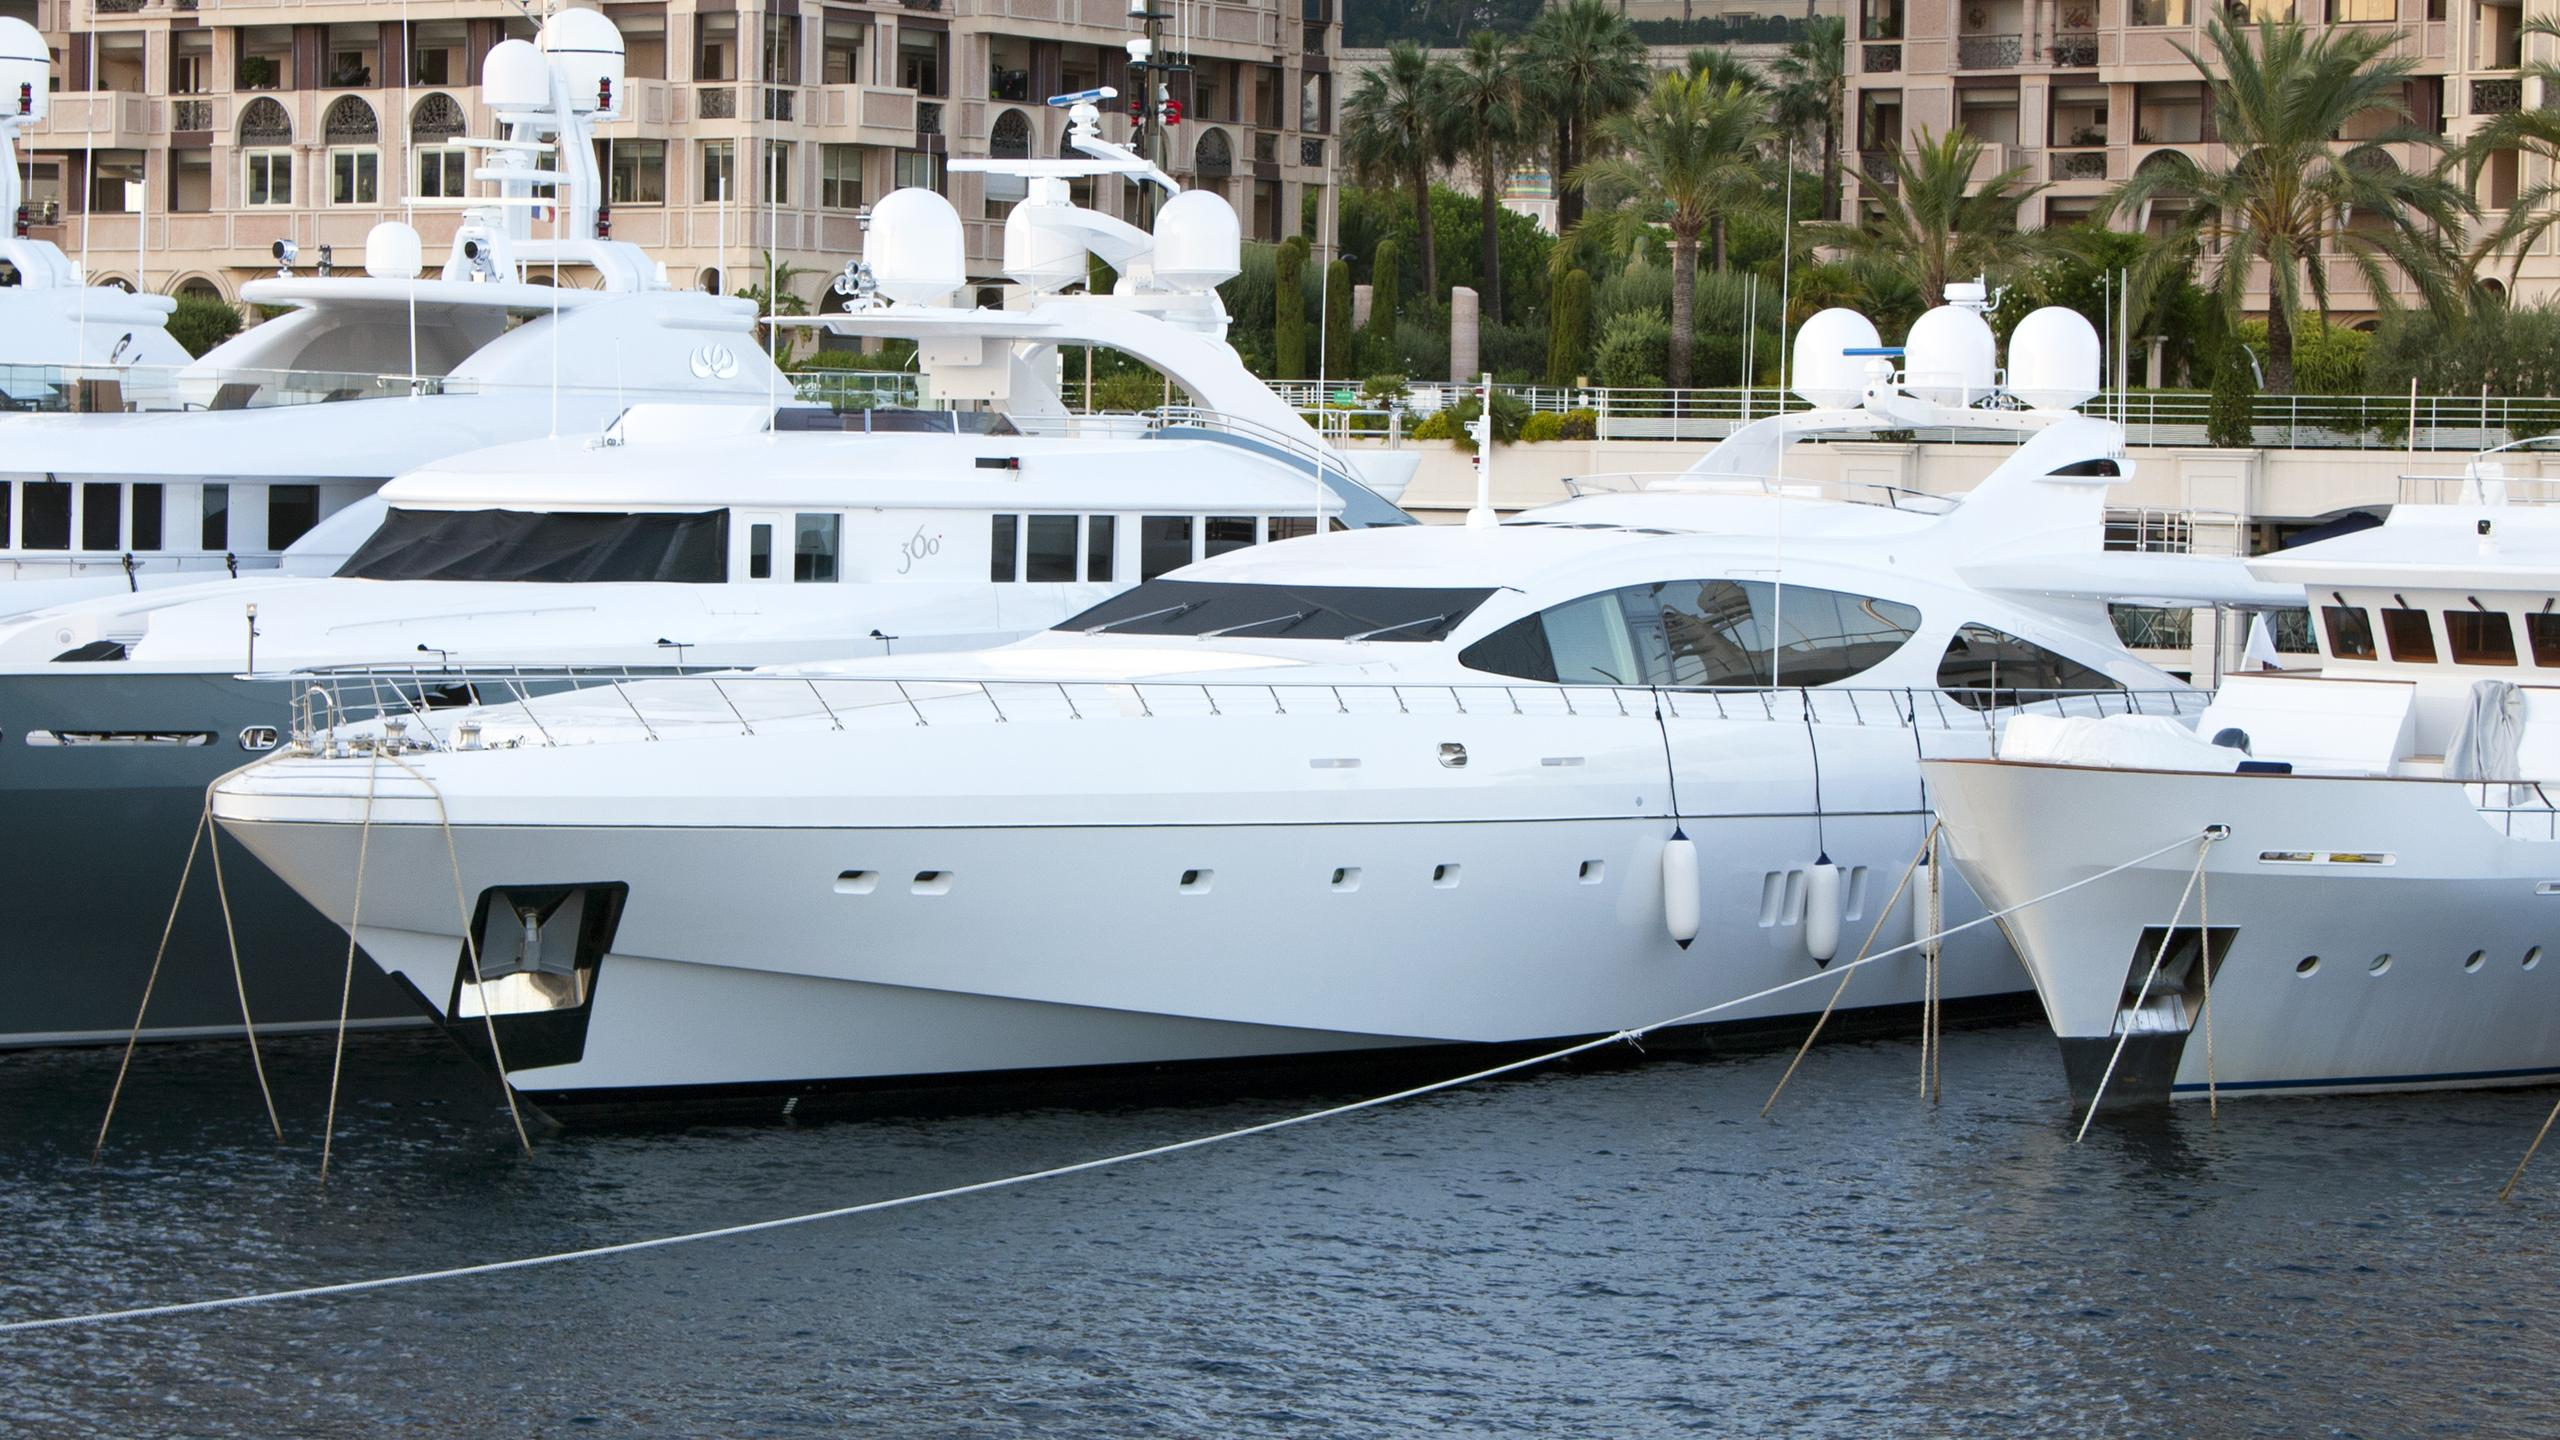 al-mirqab-iii-motor-yacht-overmarine-mangusta-165-sport-2009-50m-half-profile